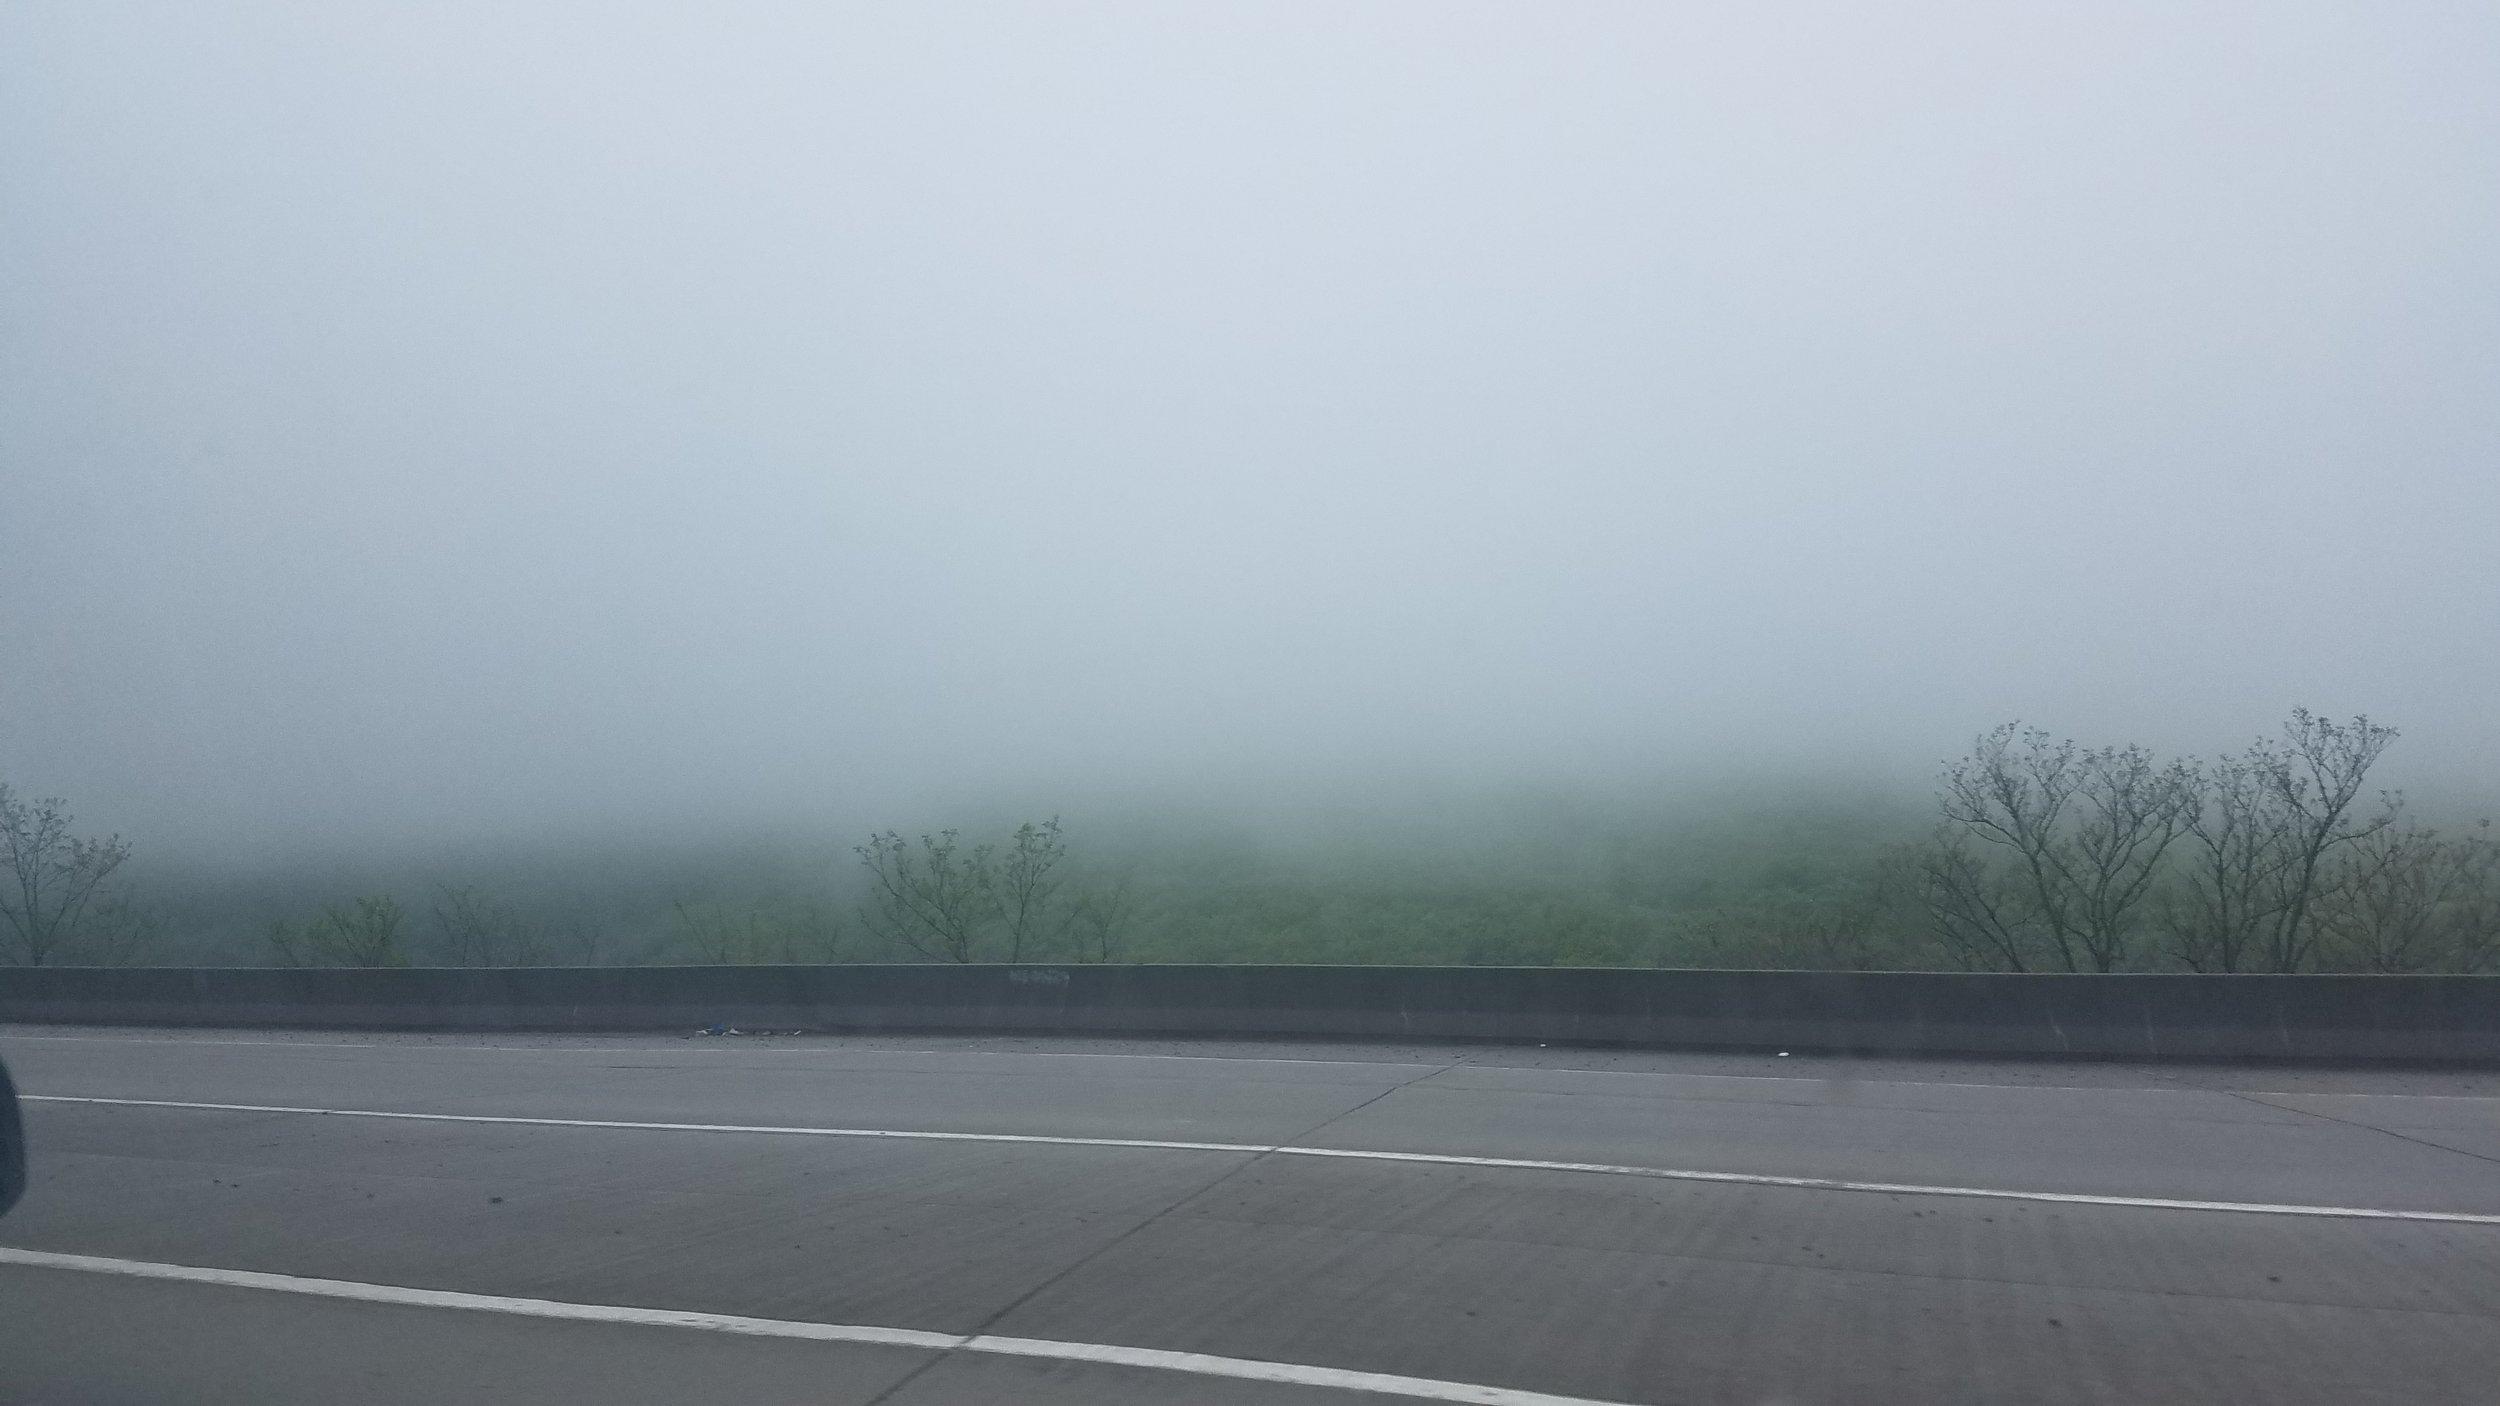 i just cannot help myself - i love the fog